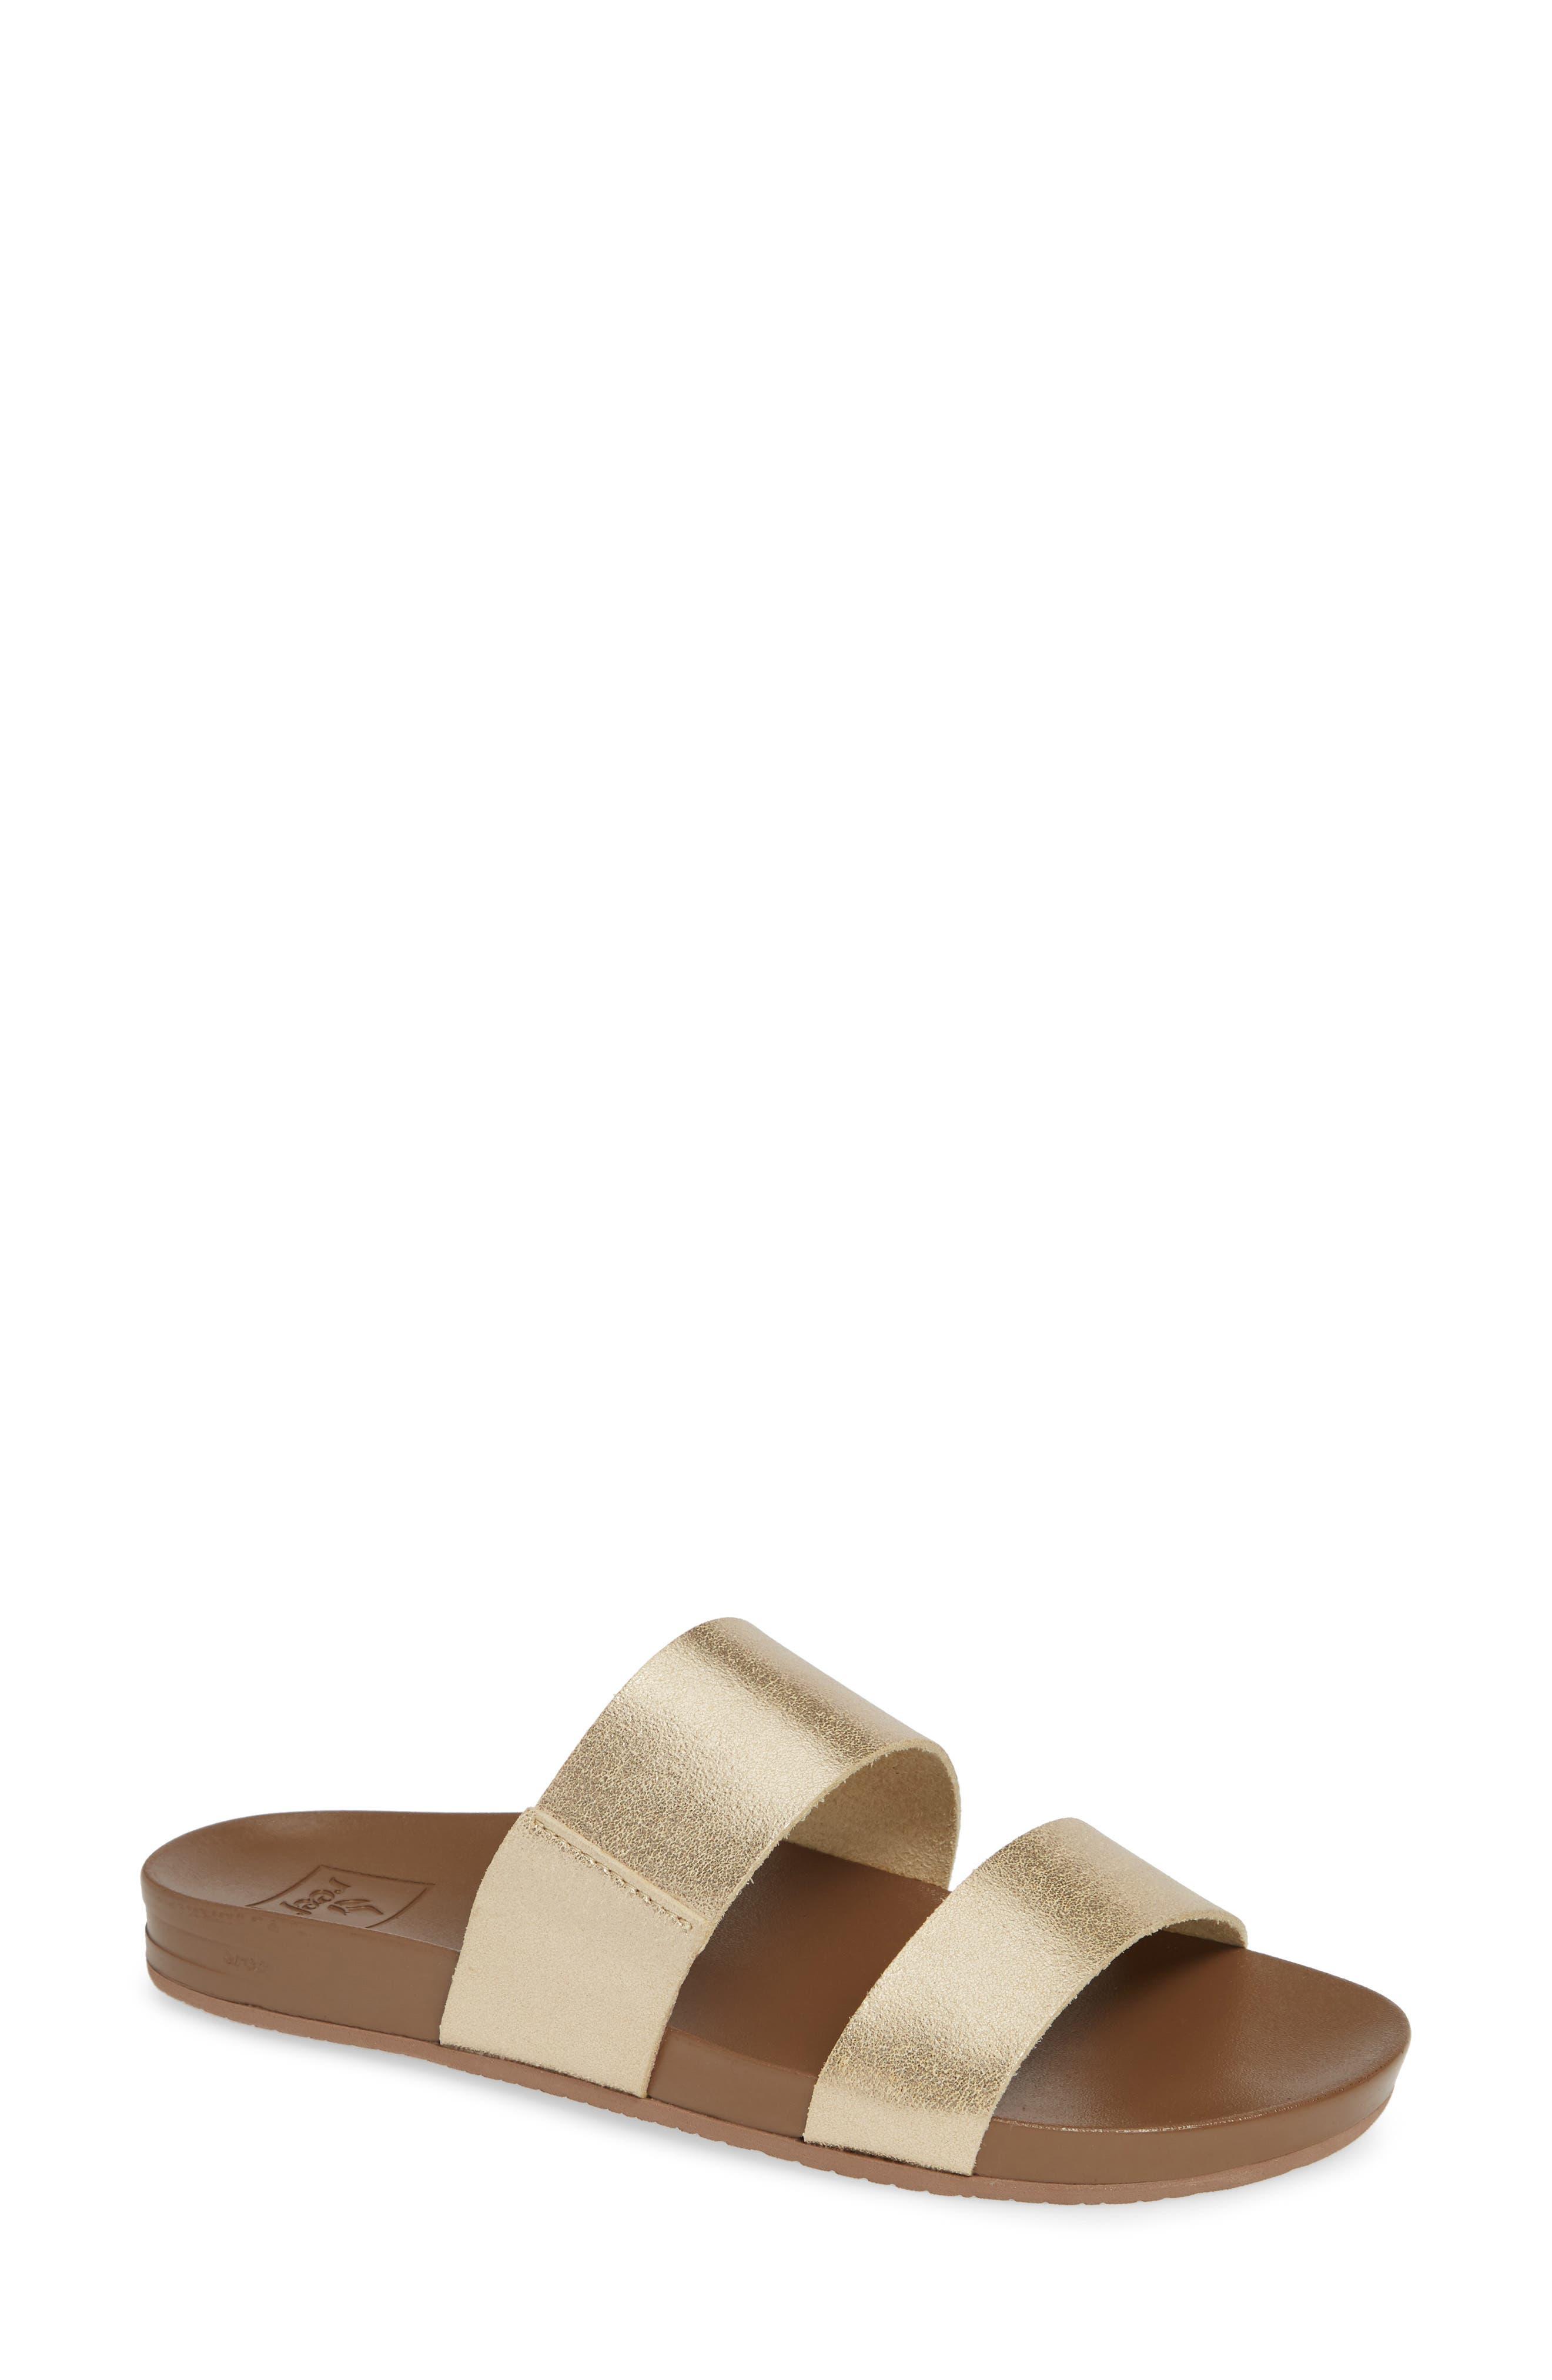 REEF,                             Cushion Bounce Vista Slide Sandal,                             Main thumbnail 1, color,                             710